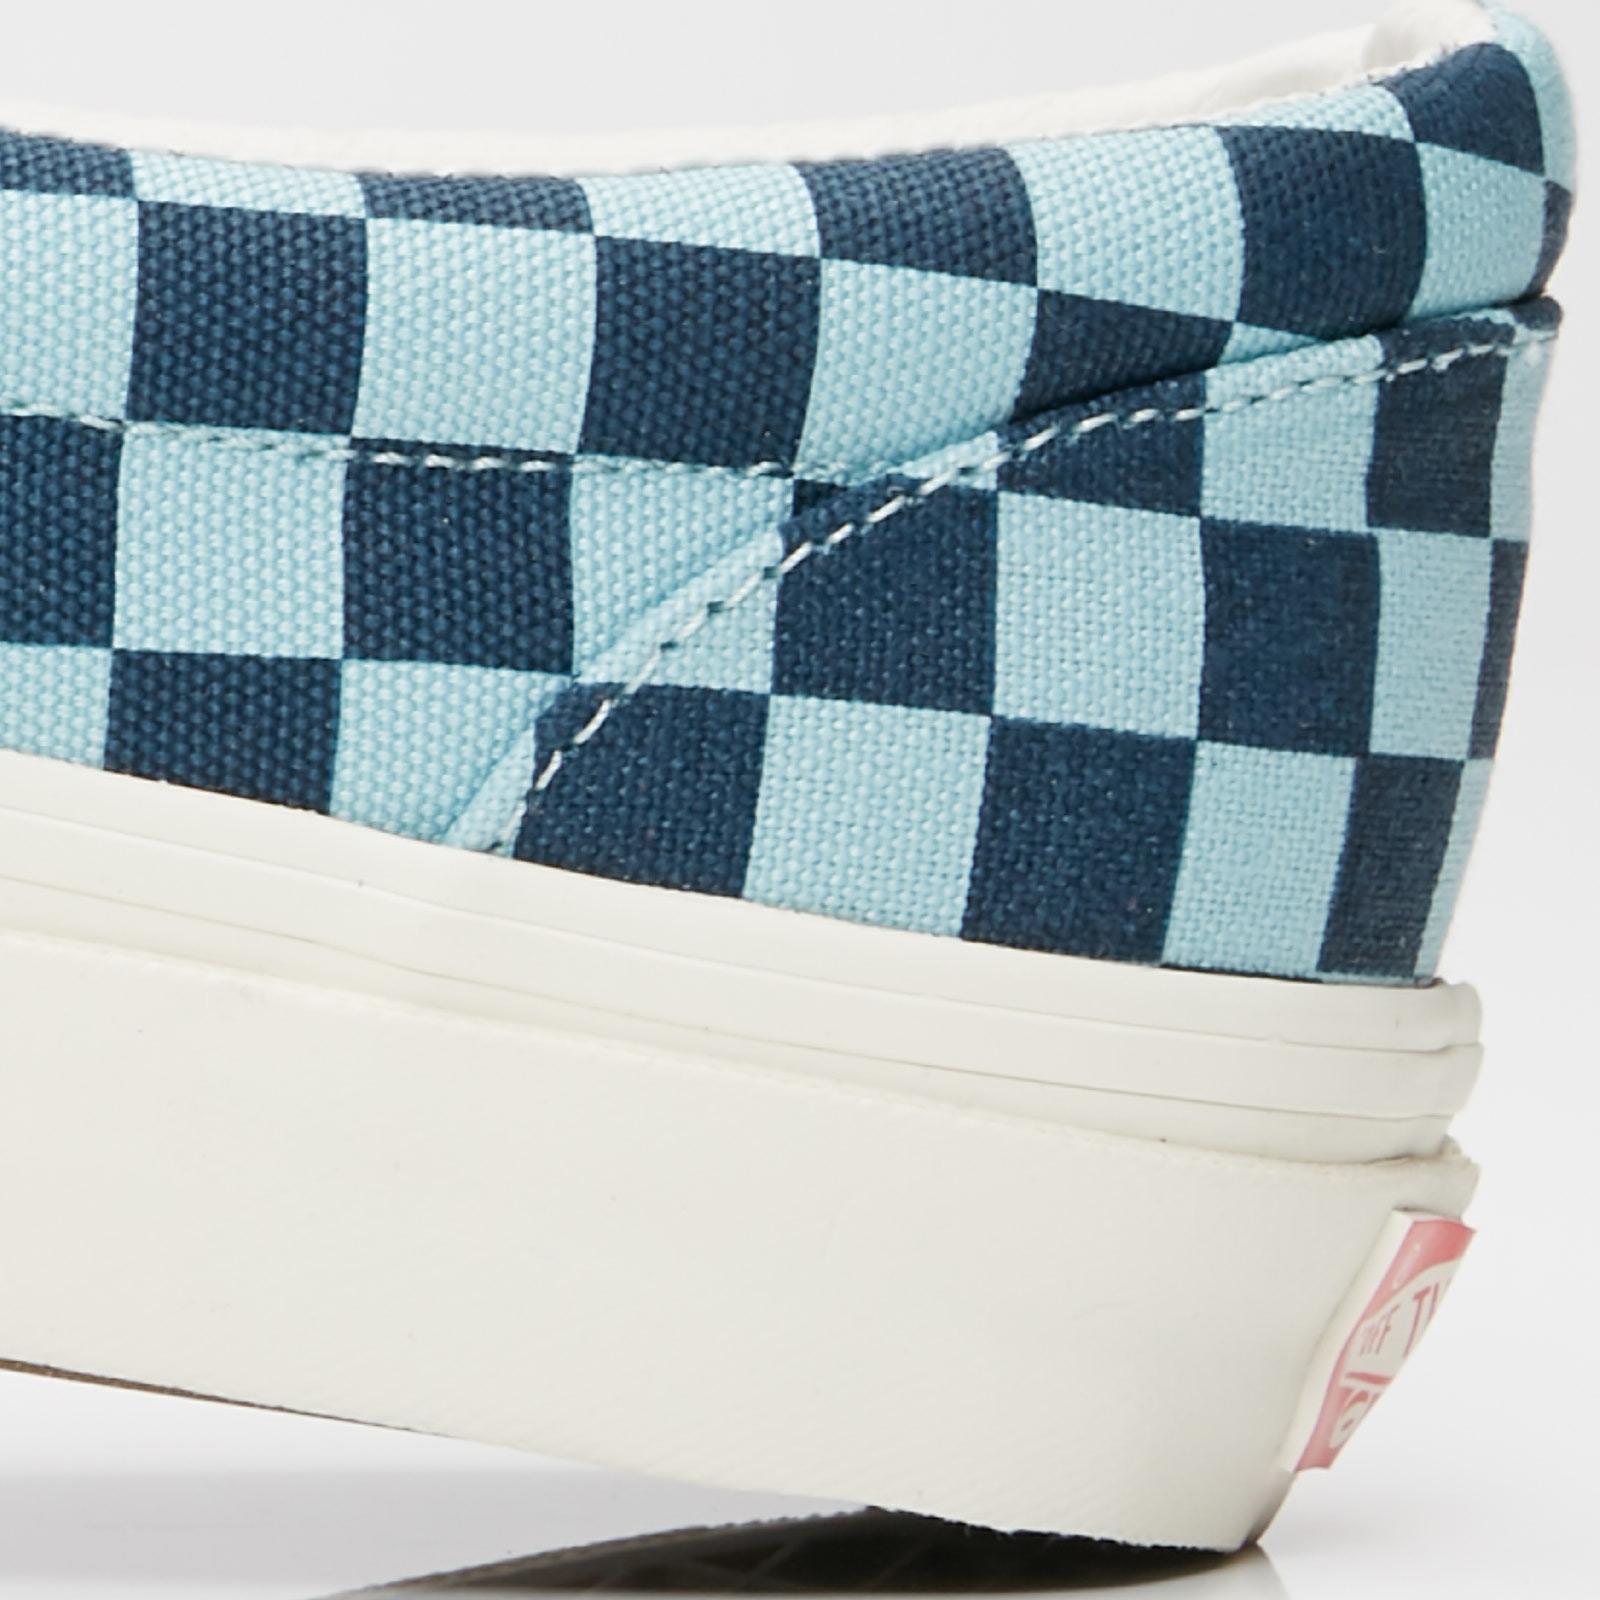 1b572b28ac9fb2 Vans UA OG Classic Slip-On LX - V00udfqlv - Sneakersnstuff ...